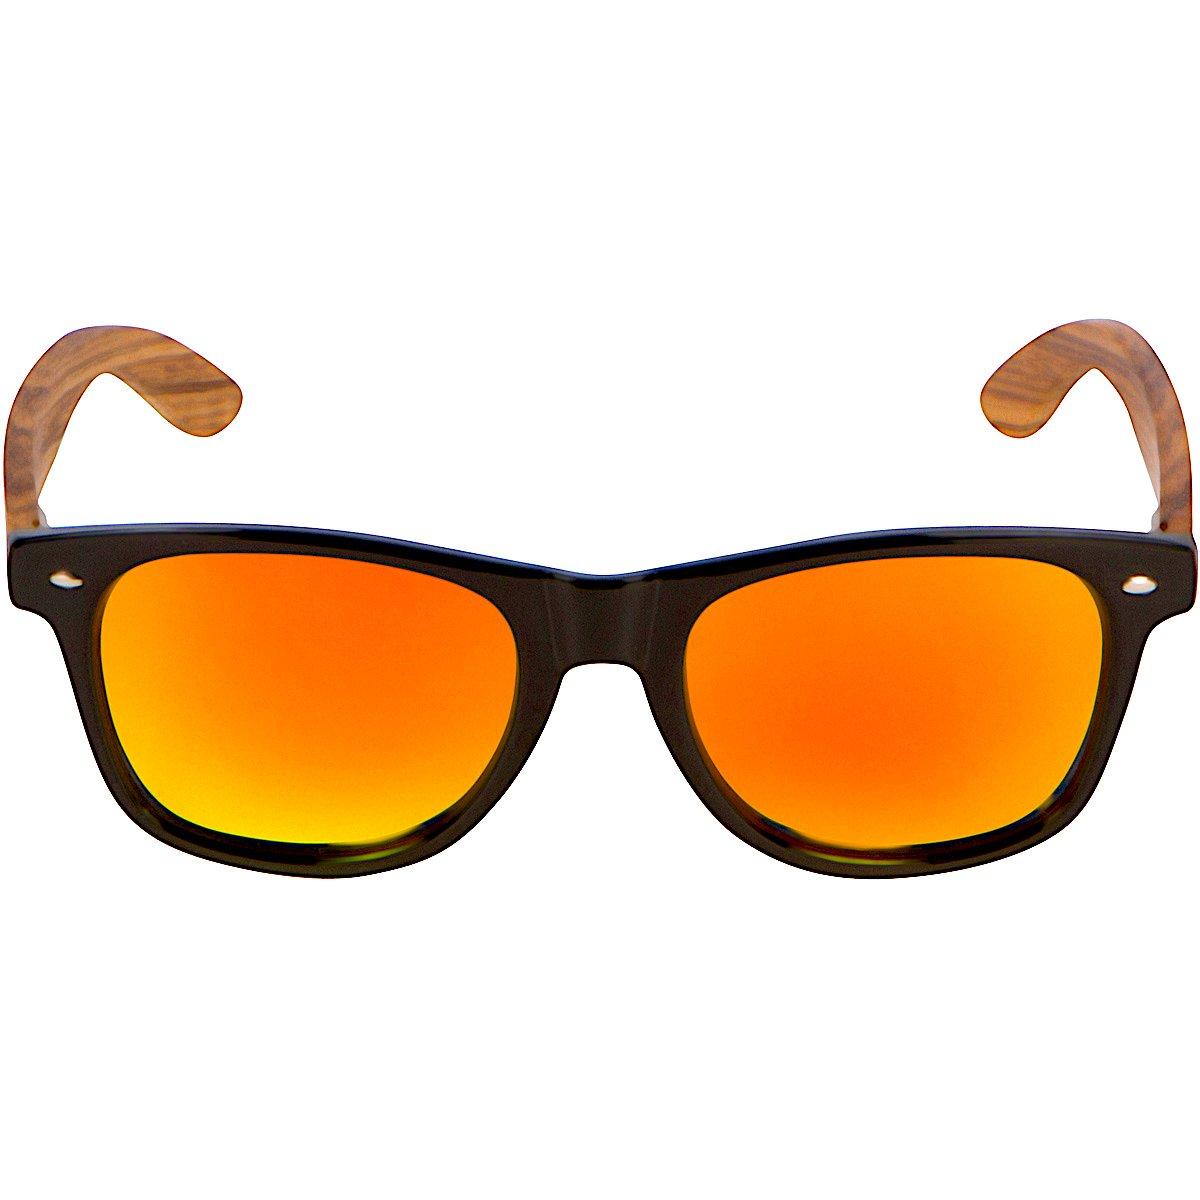 269d4bc35b Amazon.com  WOODIES Zebra Wood Sunglasses with Orange Mirror Polarized  Lens  Clothing